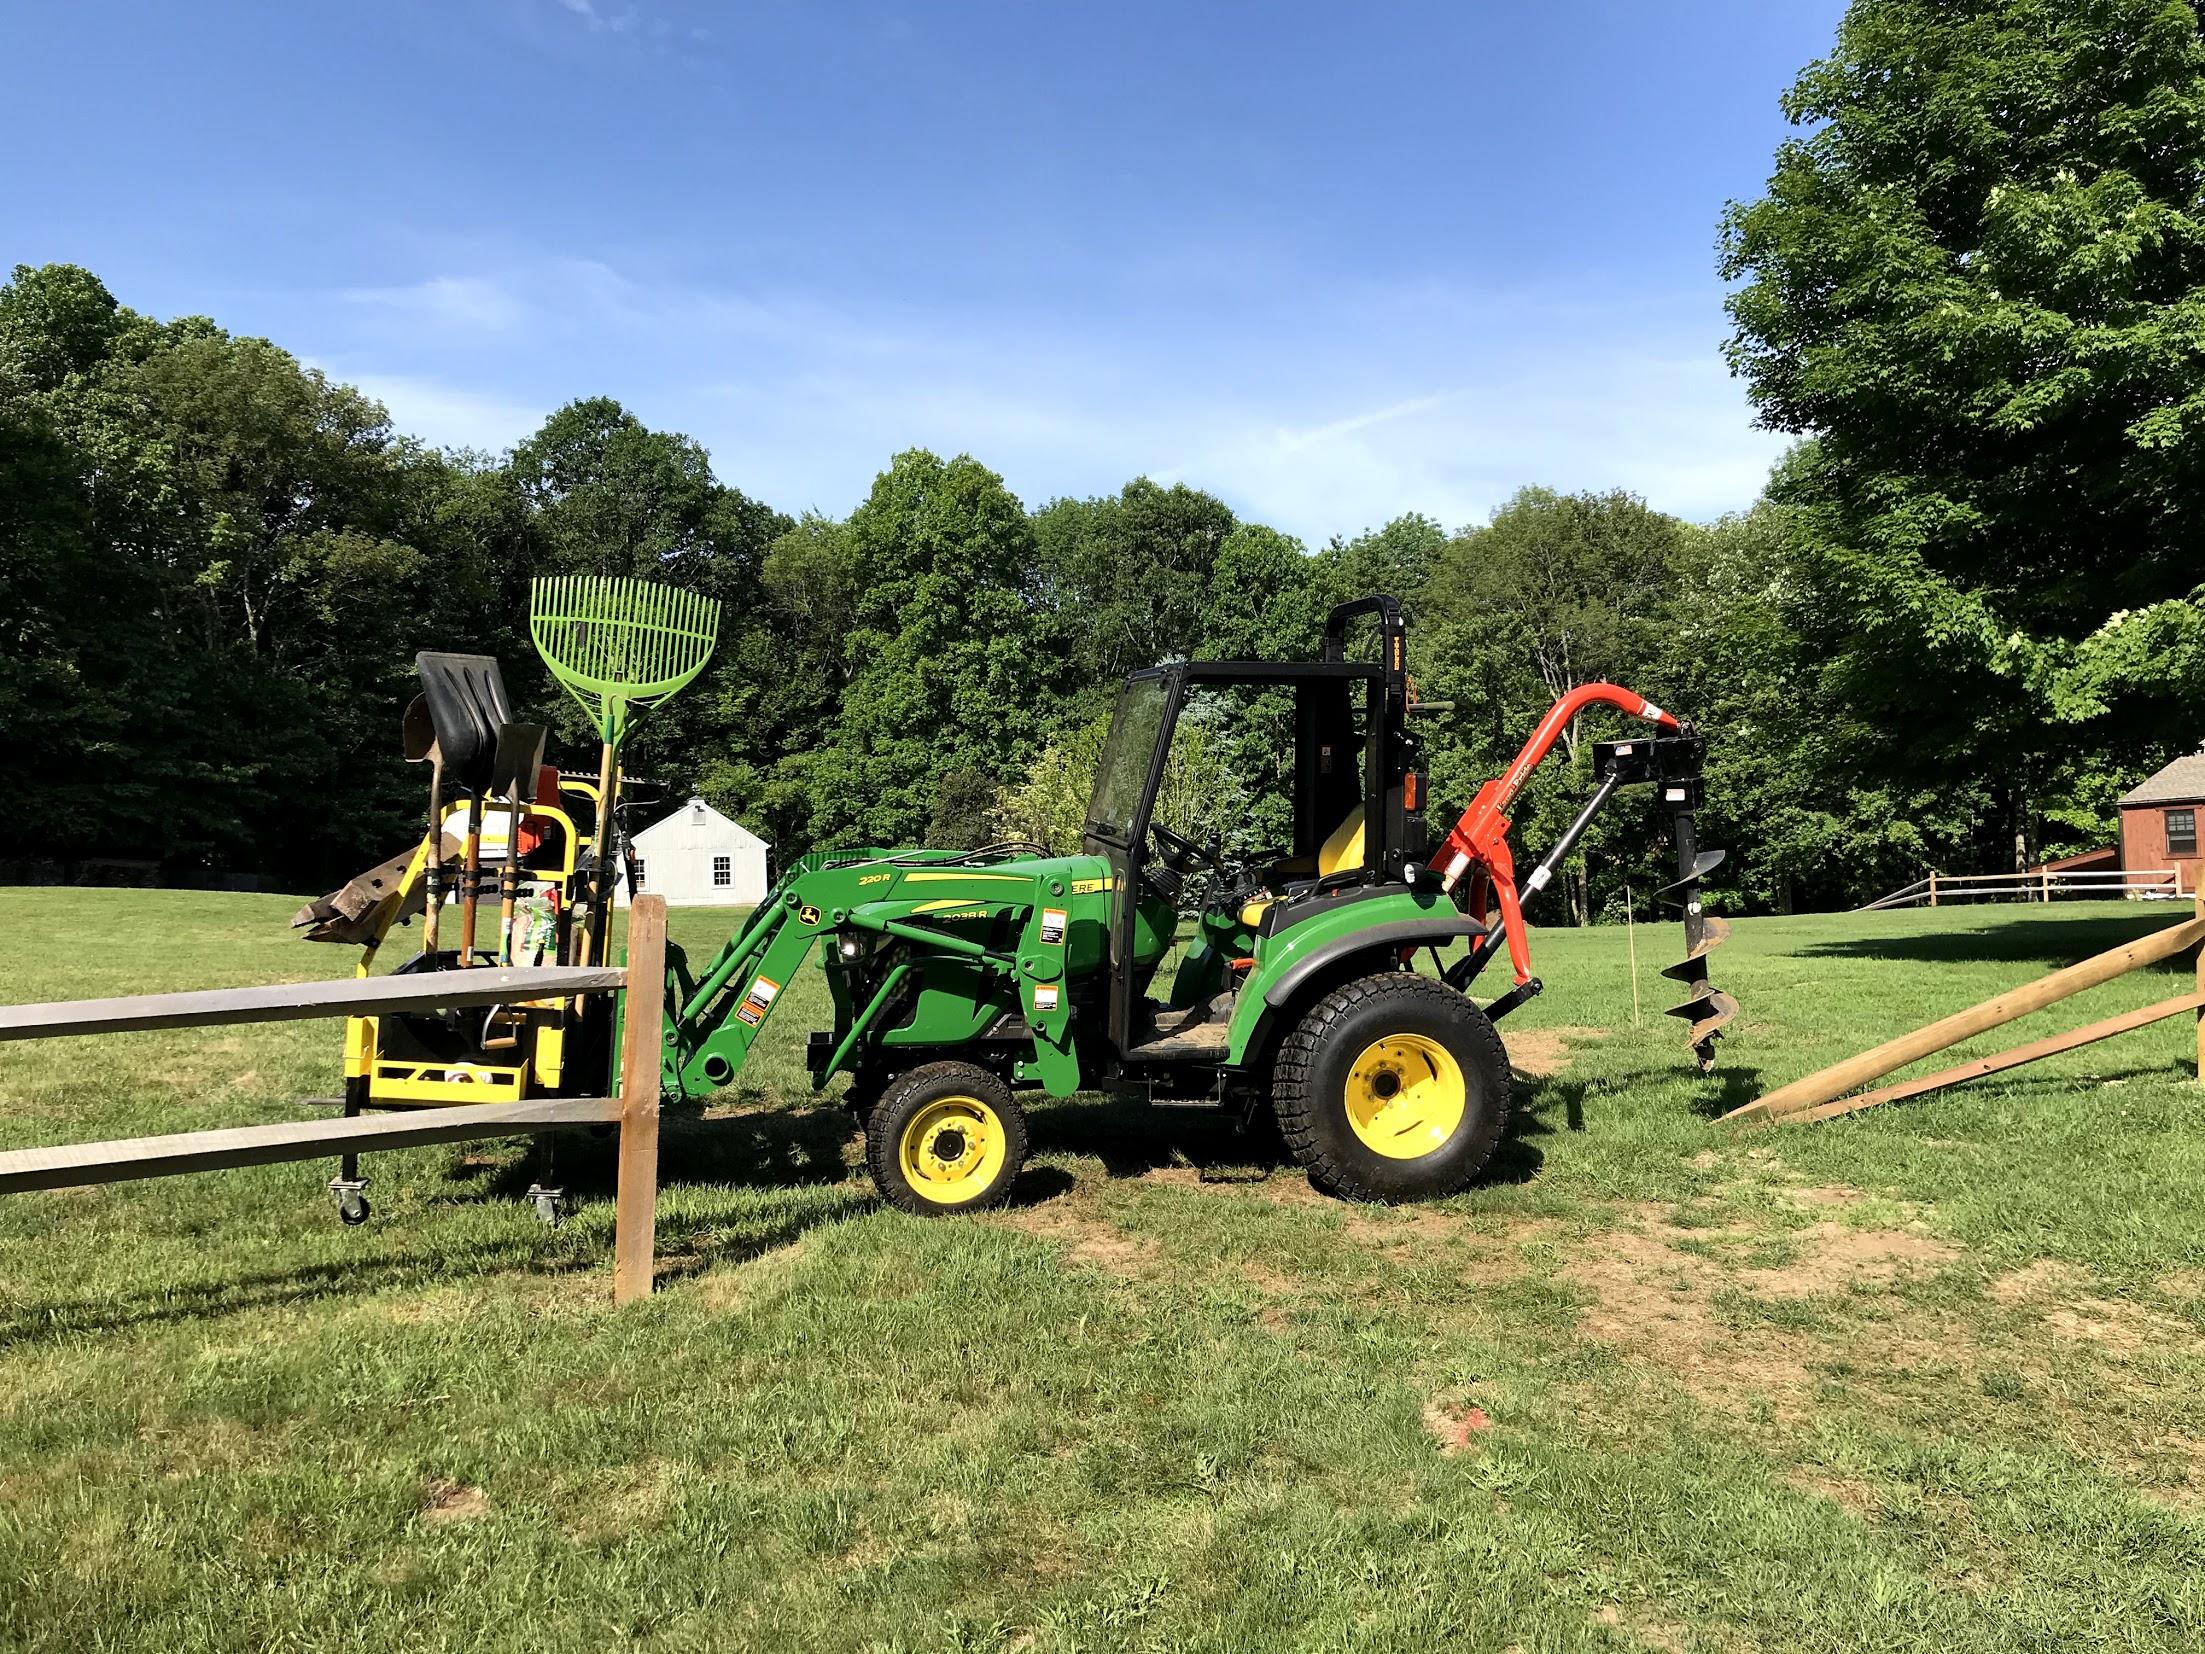 Bigtoolrack Fencing, fencing for tool tractor, install split rail fence using Bigtoolrack, buy rail fencing for tractor, wood rail for tractor, buy wood split fence fence,